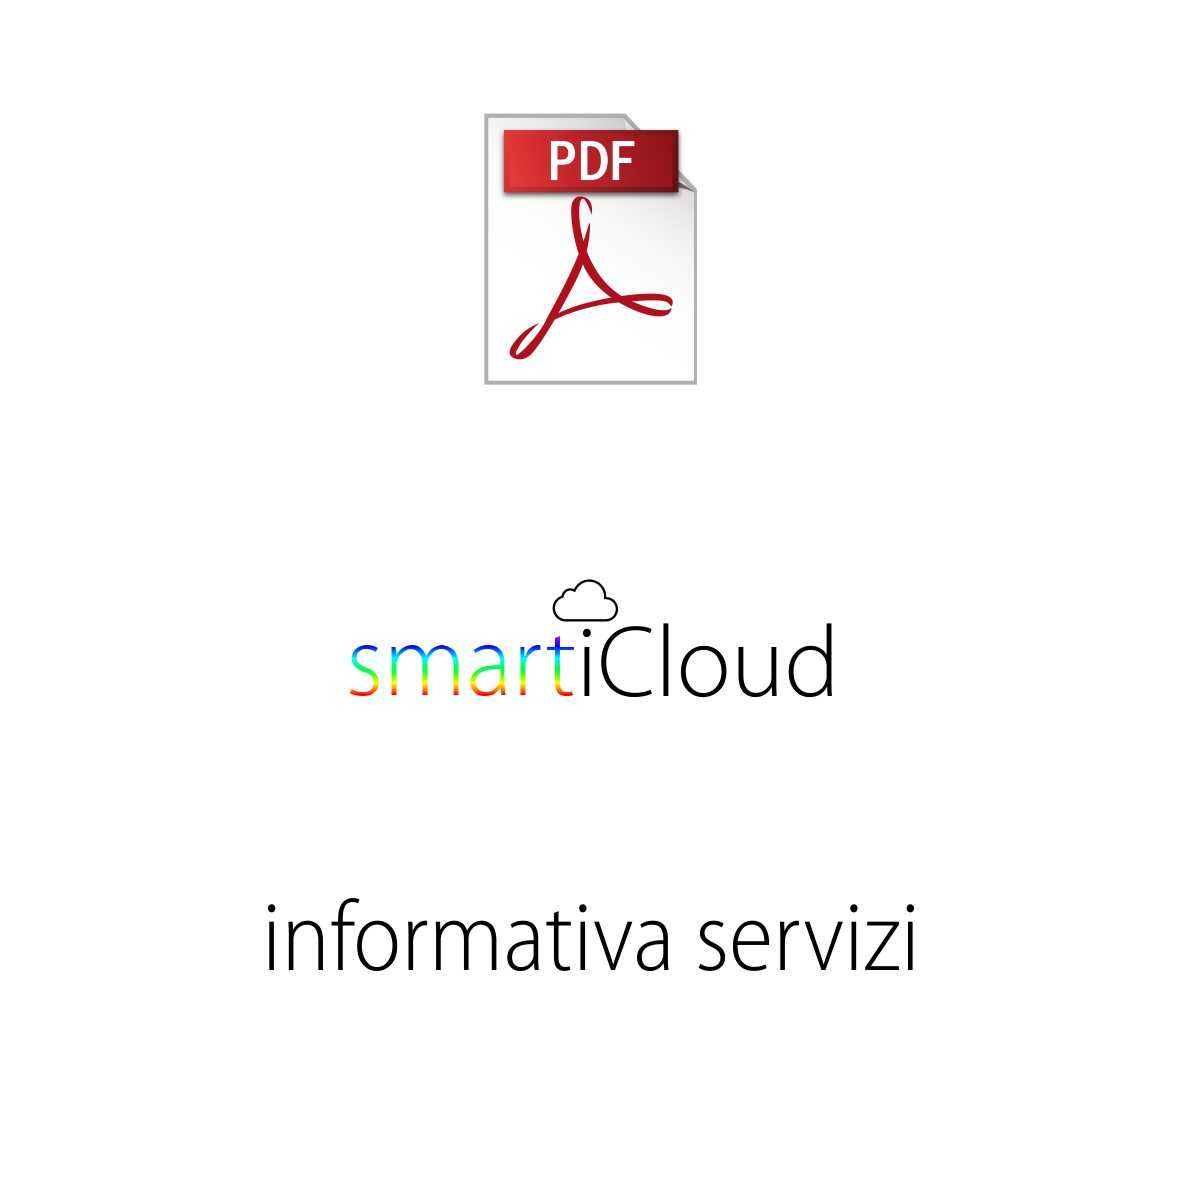 promelit - pdf 10.png